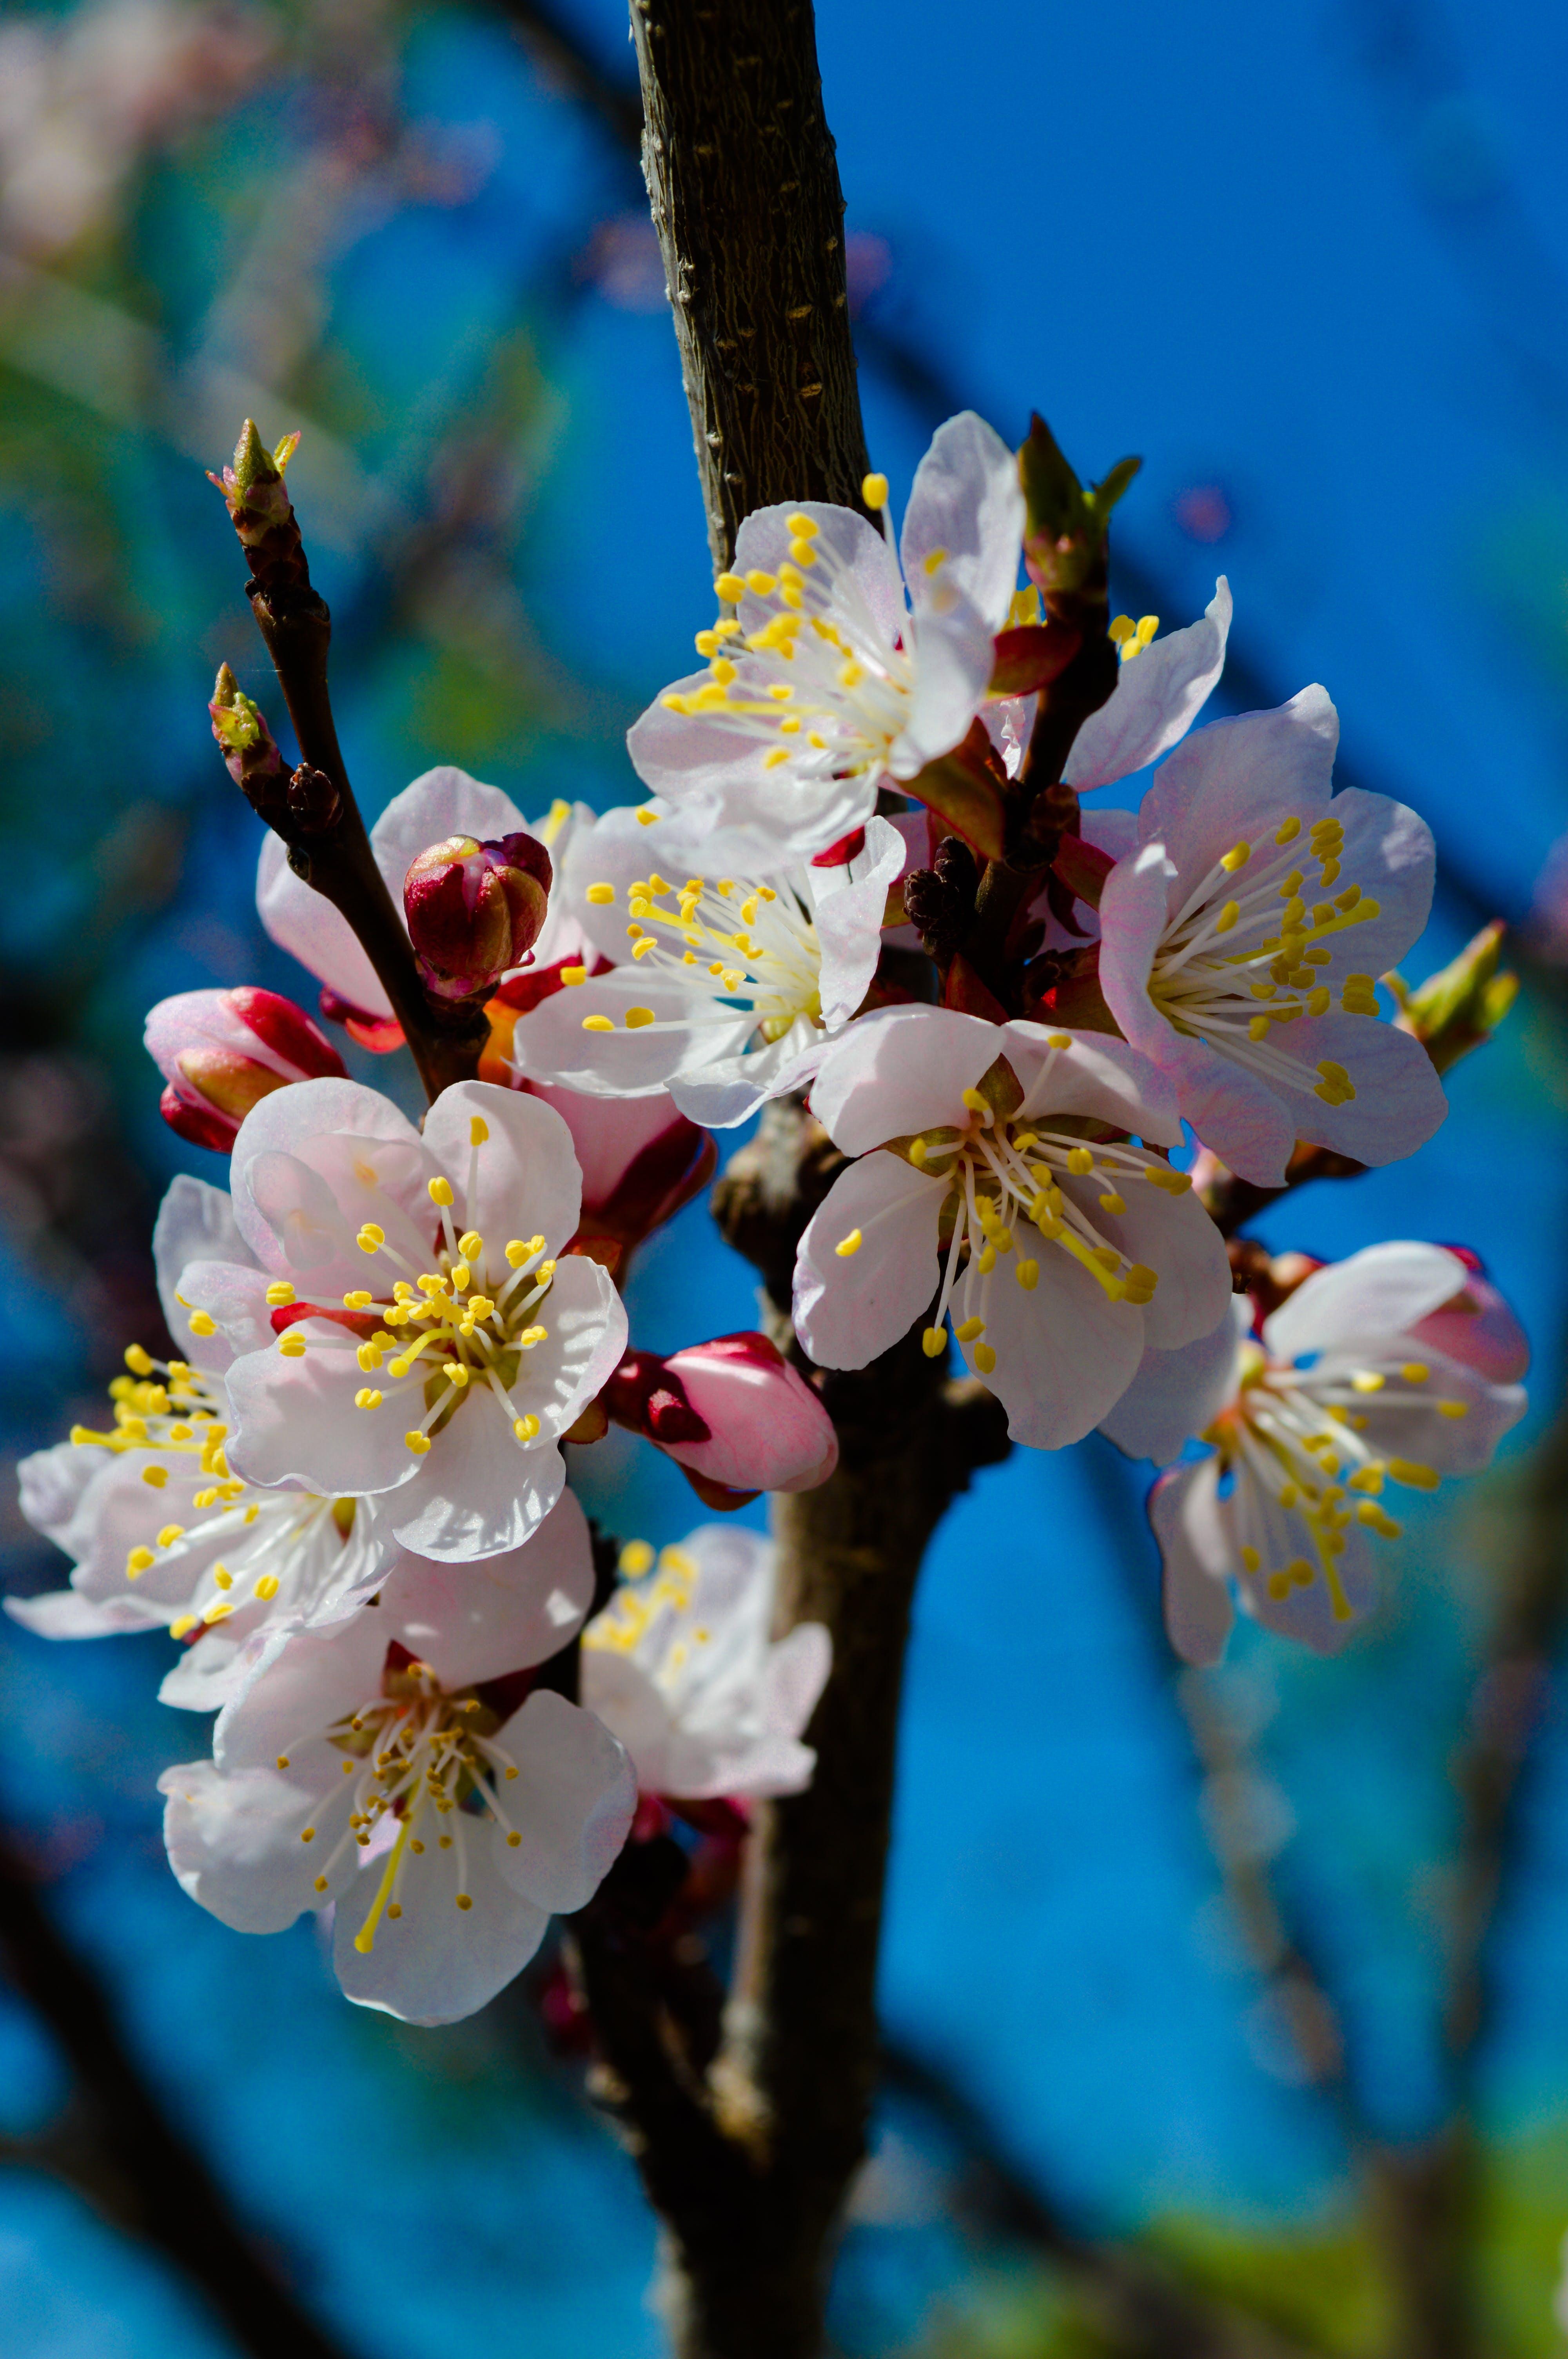 Free stock photo of цветы, ветка, крупный план